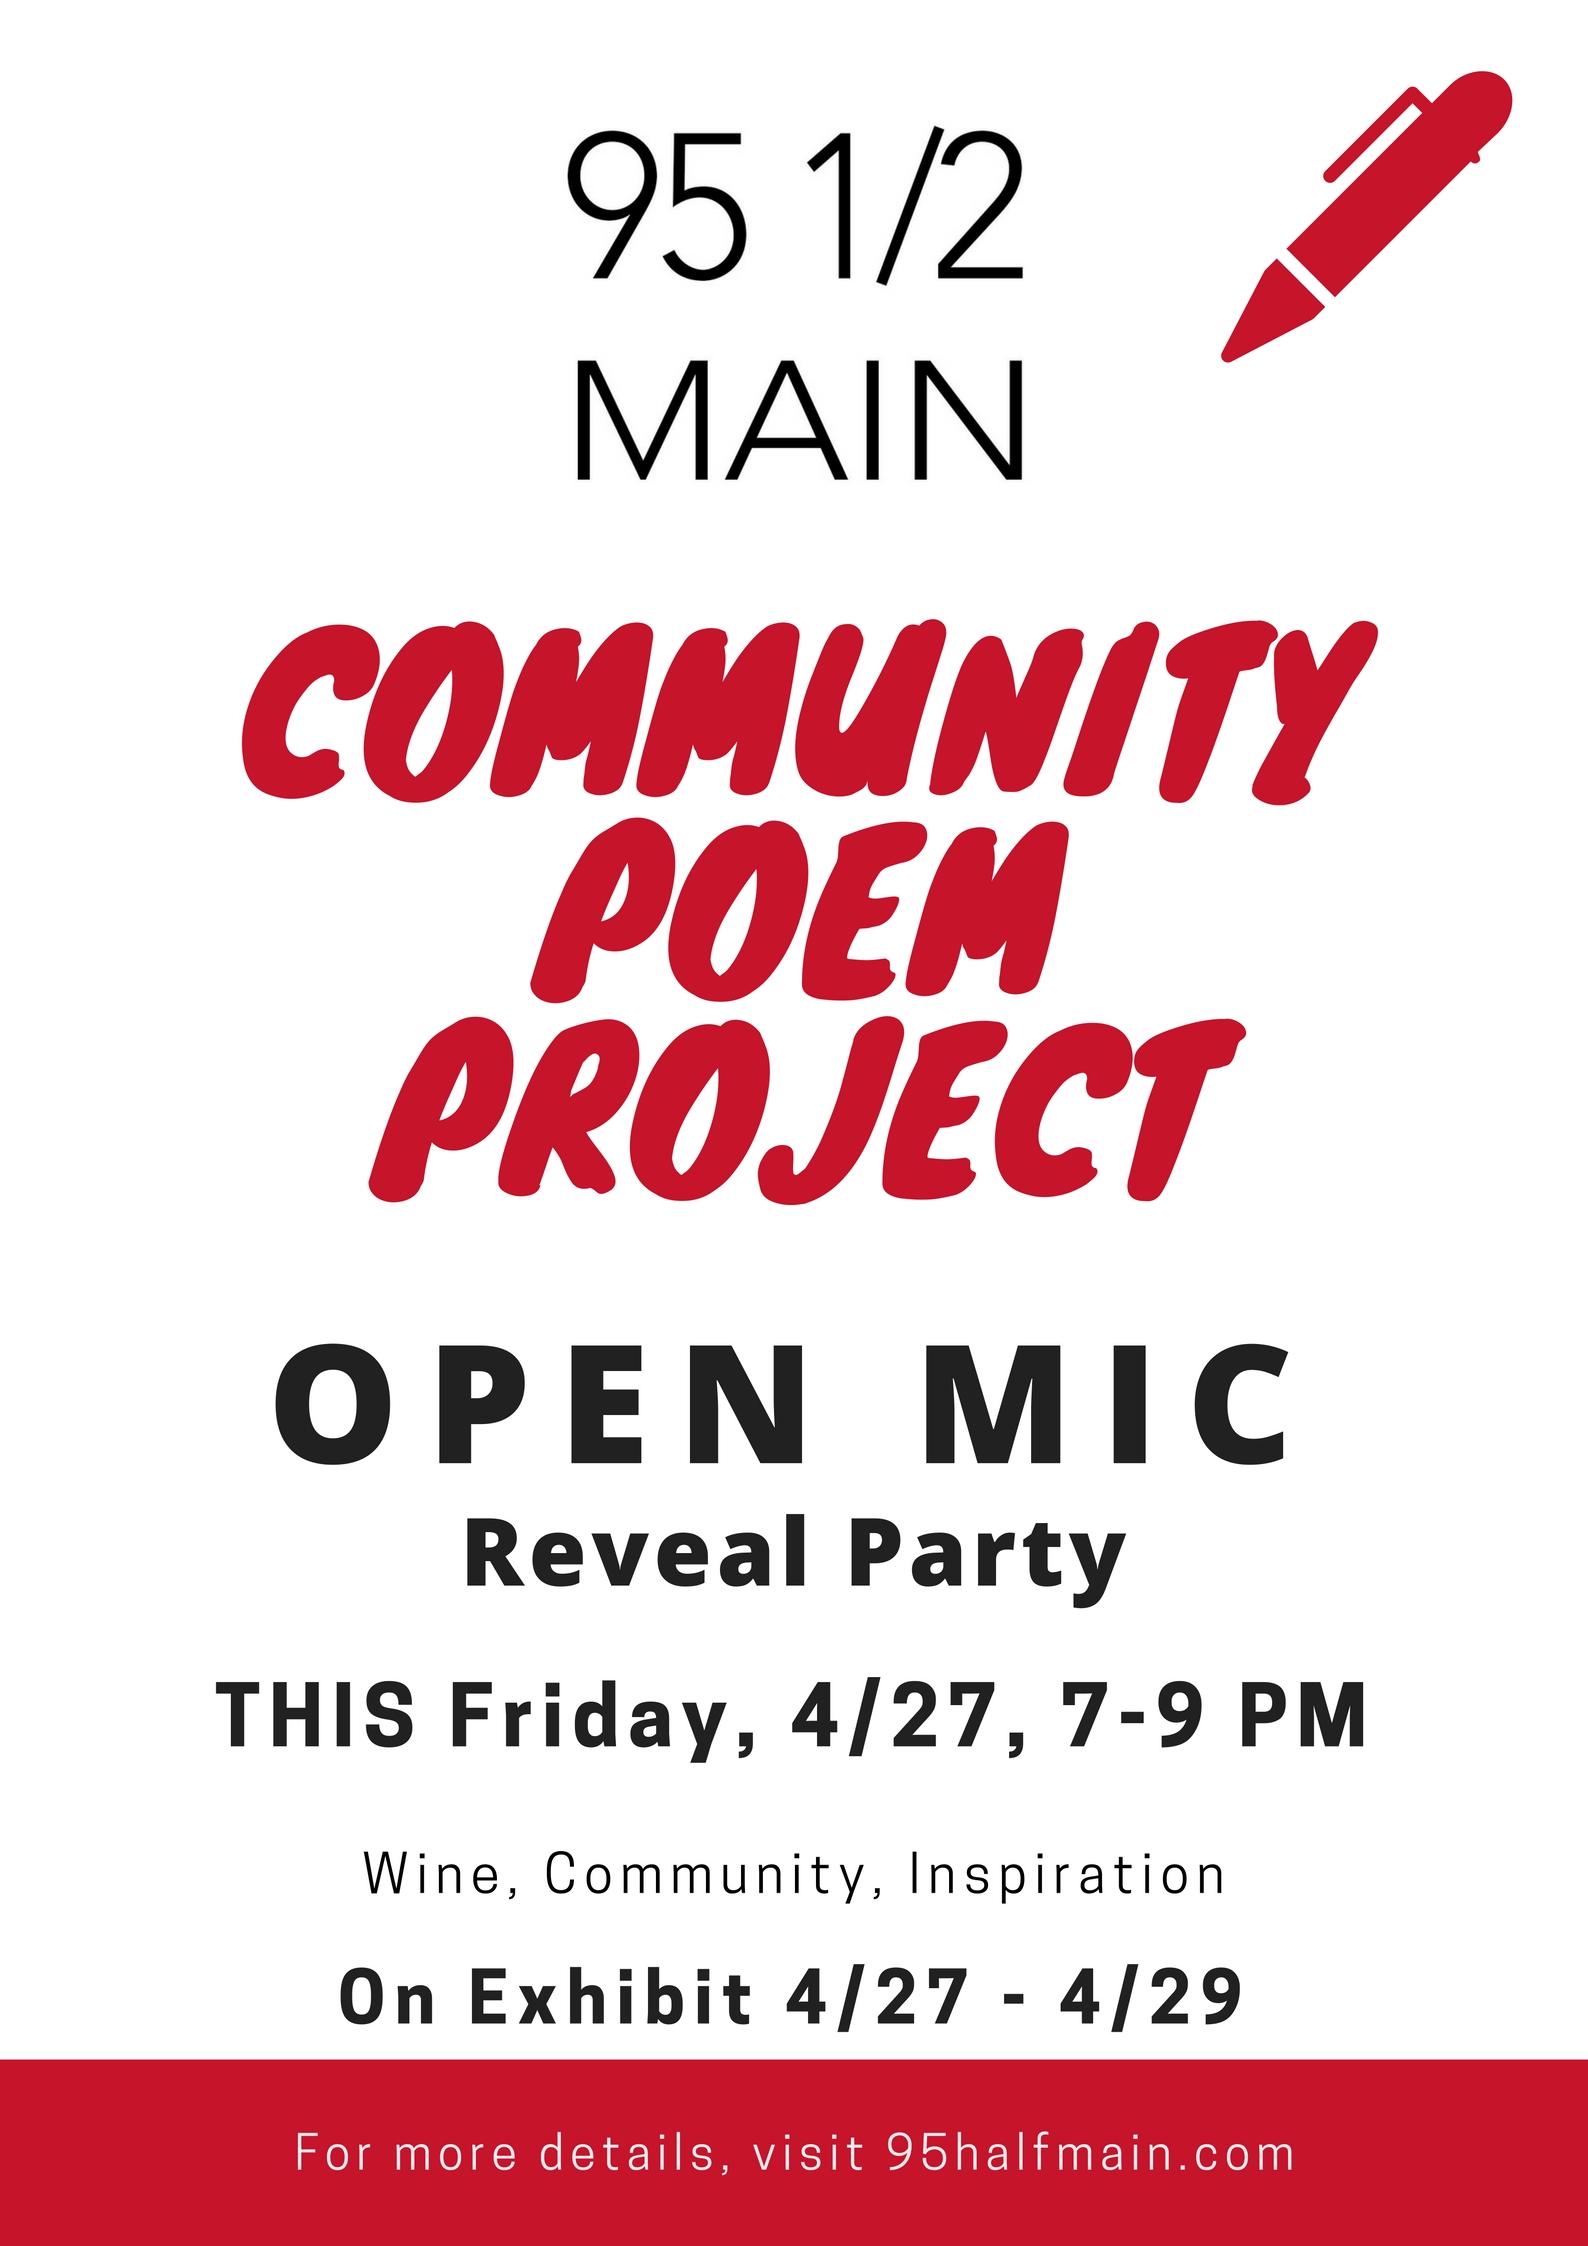 Community Poem Project Open Mic.jpg